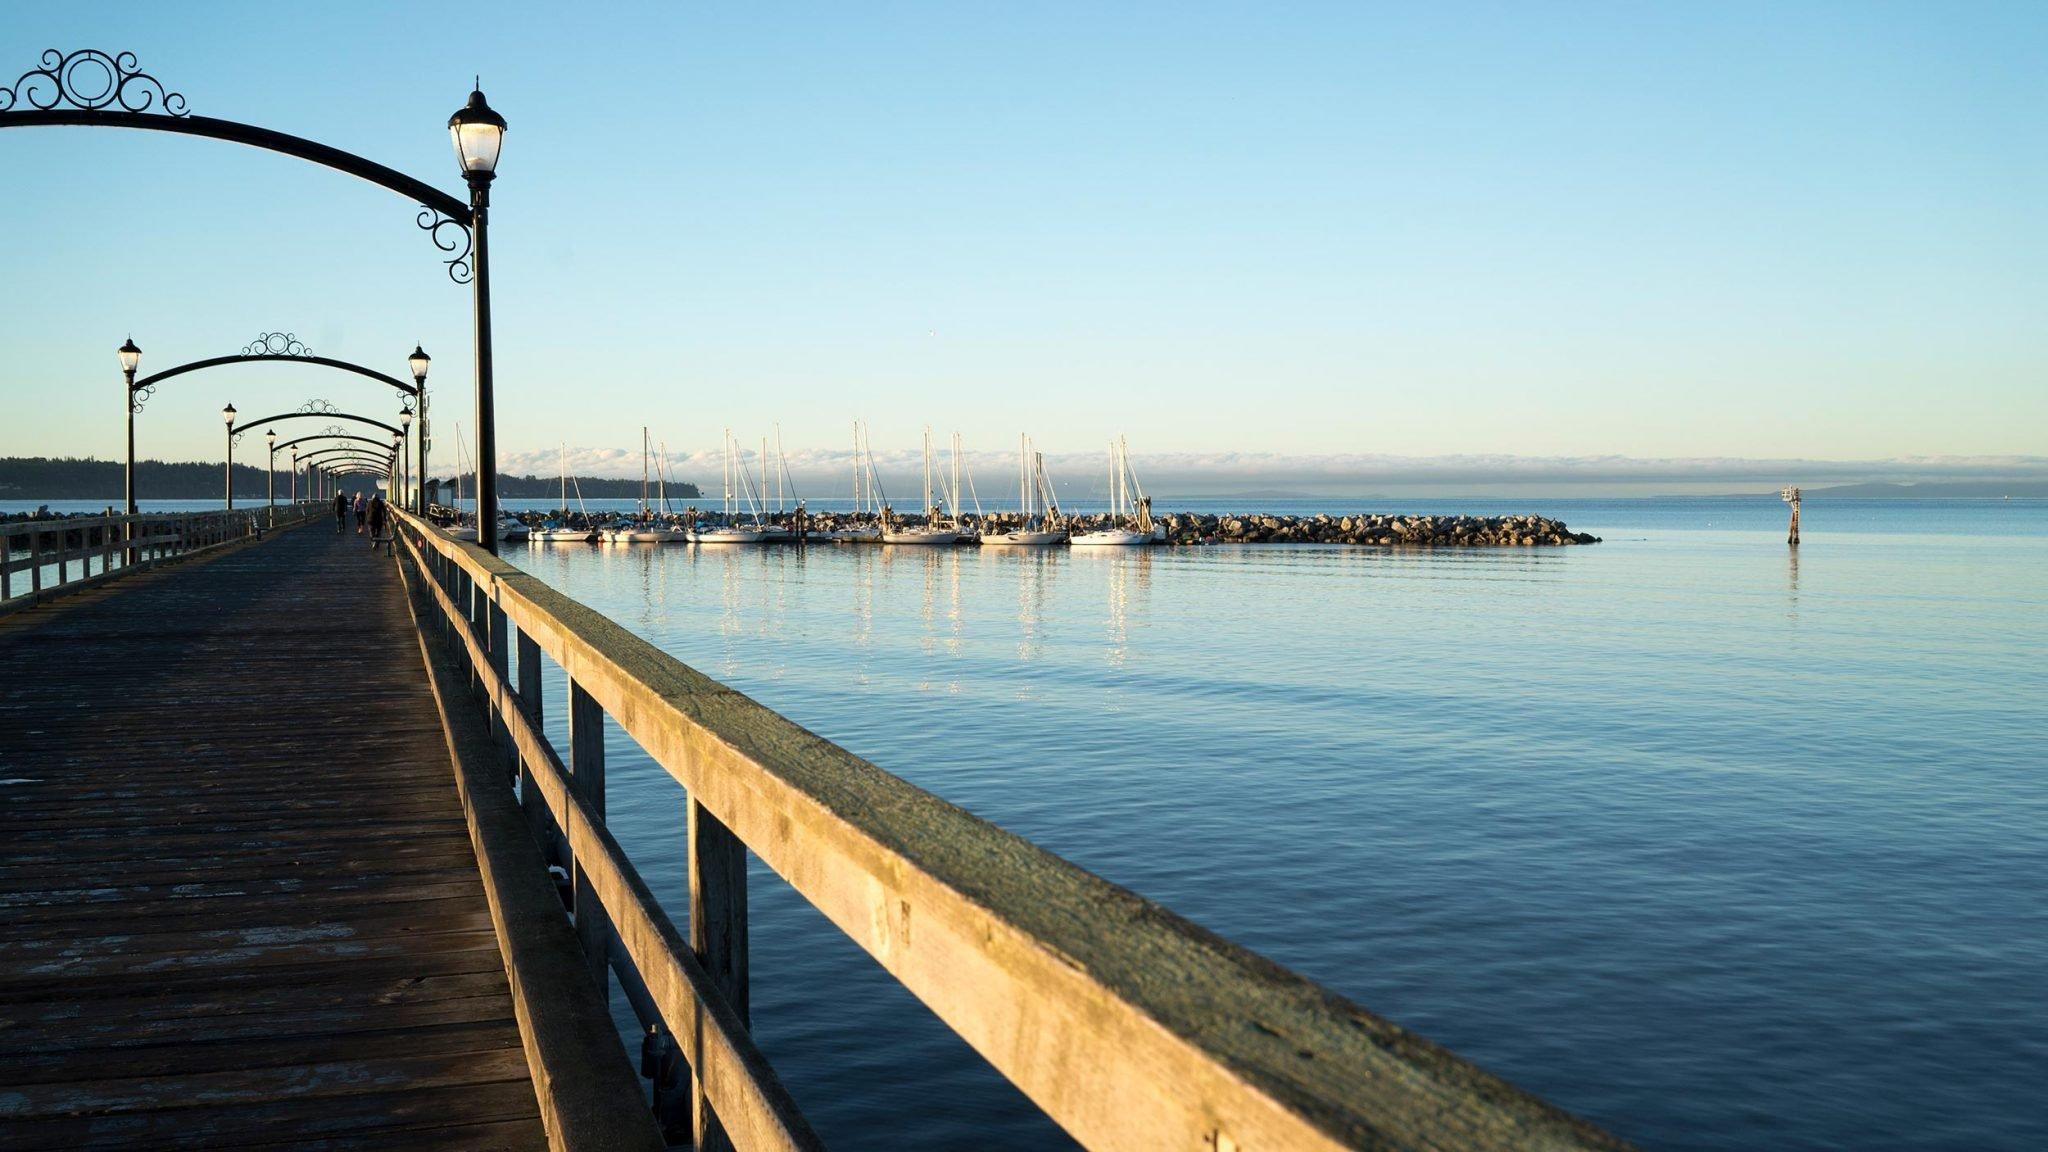 The Pier!